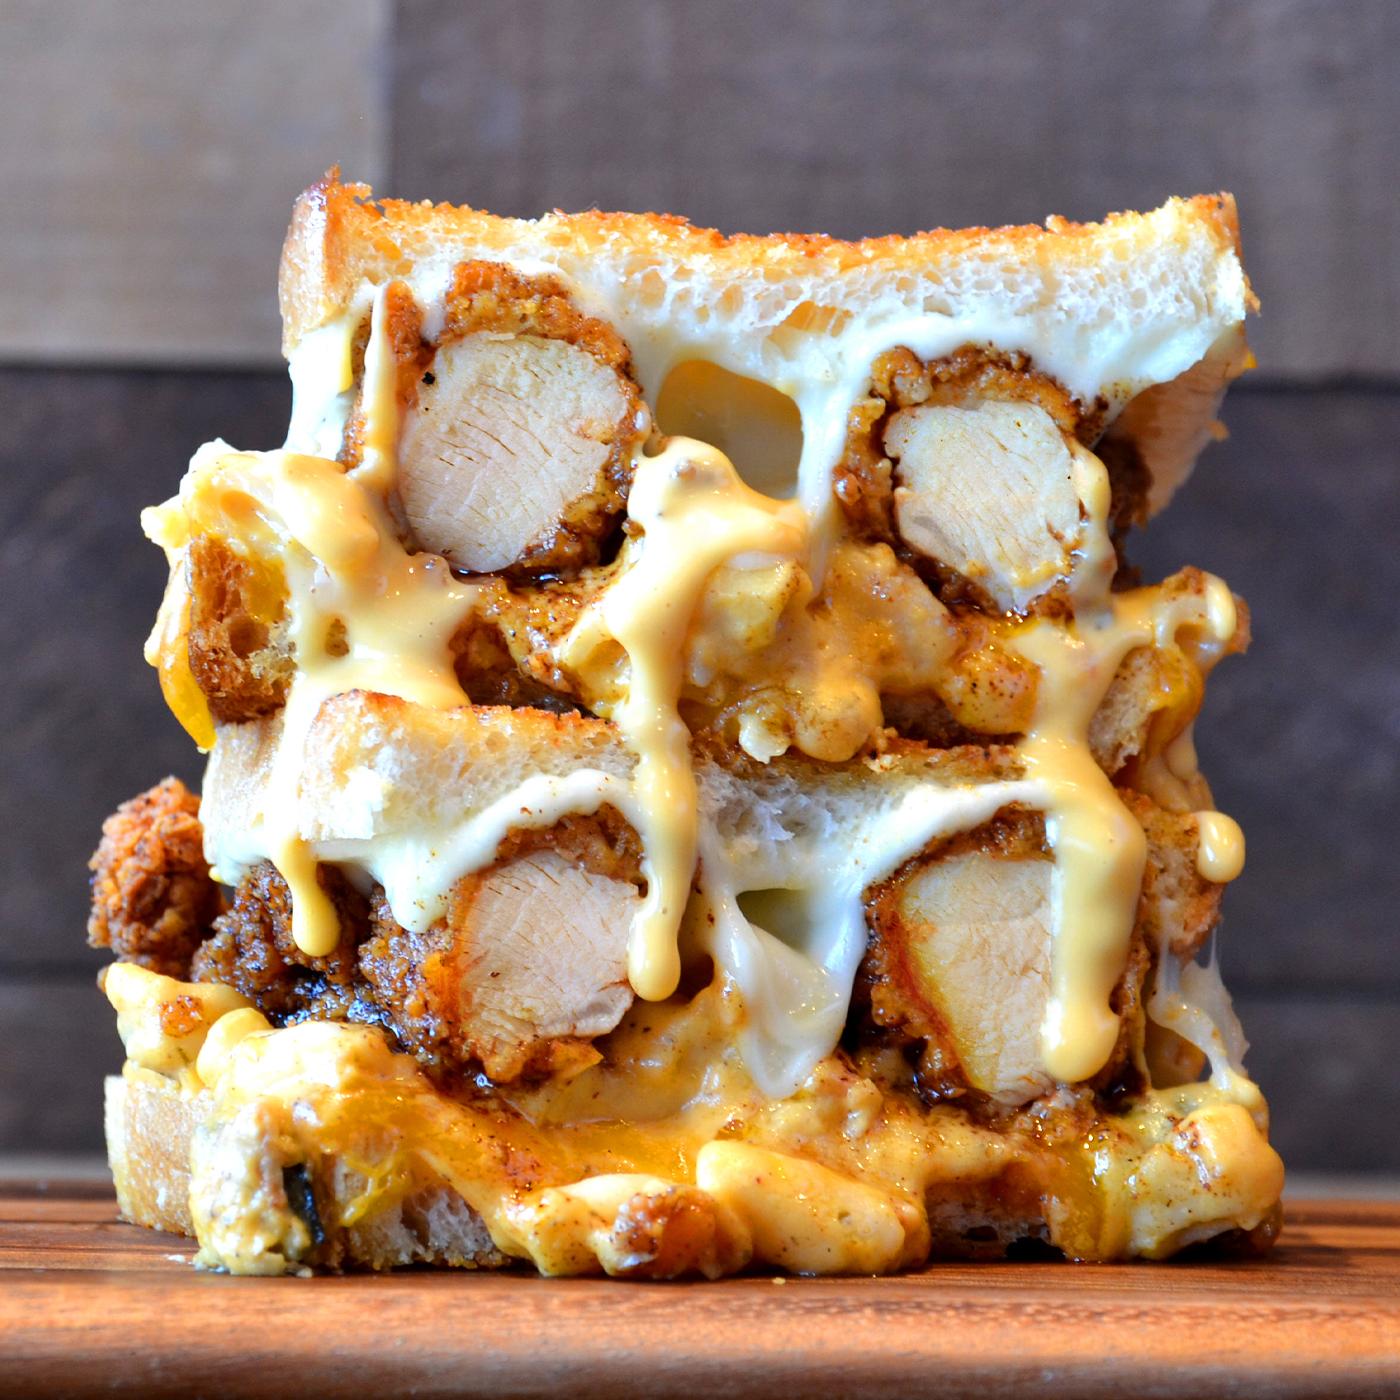 Nashville Grilled Cheese